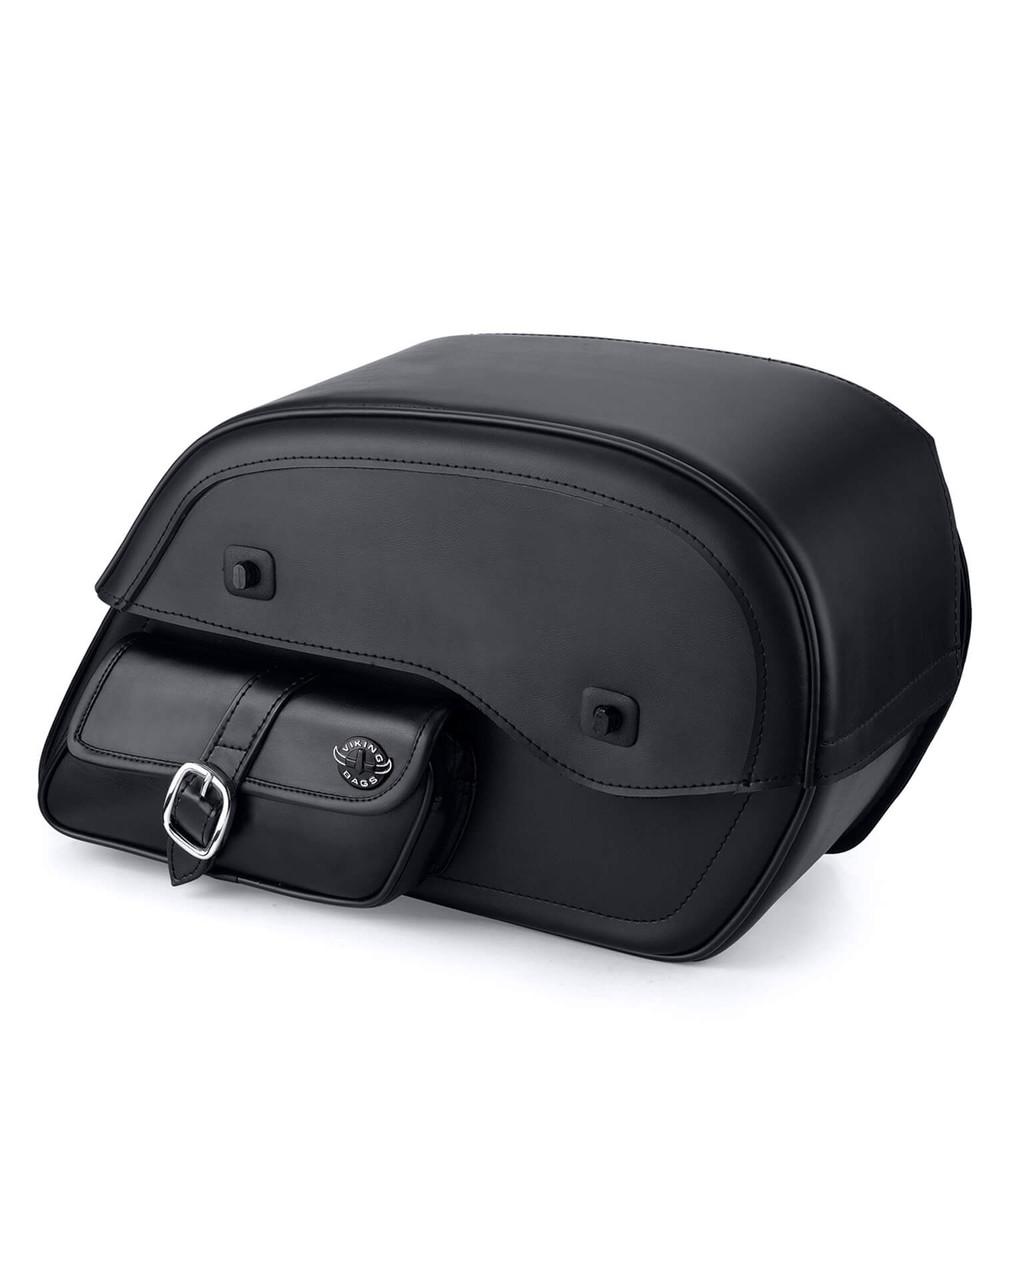 Suzuki Intruder 1500 VL1500 SS Side Pocket Motorcycle Saddlebags Main Bag View